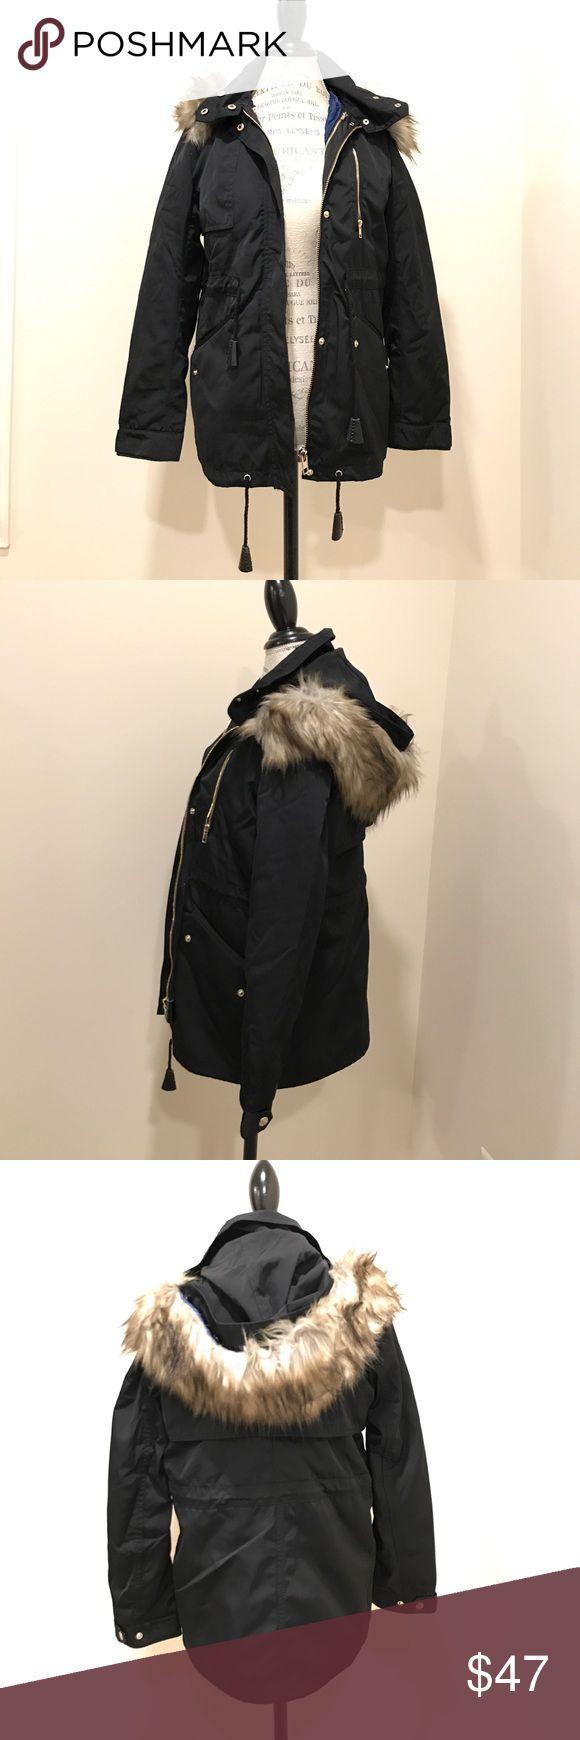 Zara winter jacket - new without tag Detachable furry hood + detachable blue lining pad+ very dark navy color Zara Jackets & Coats